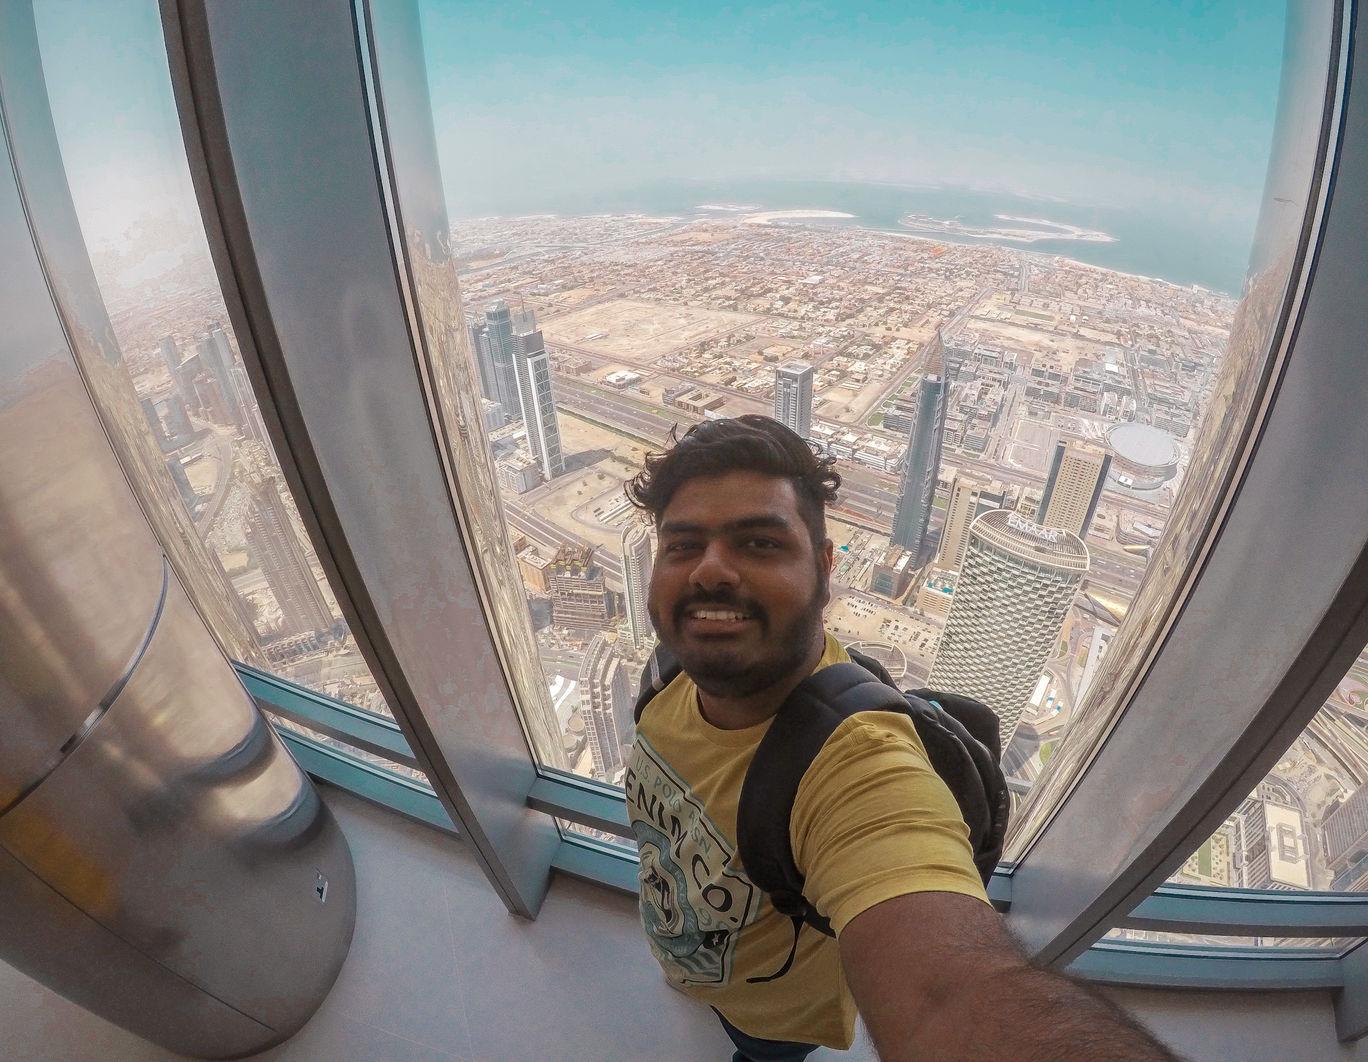 Photo of Burj Khalifa - Dubai - United Arab Emirates By Elton D'souza